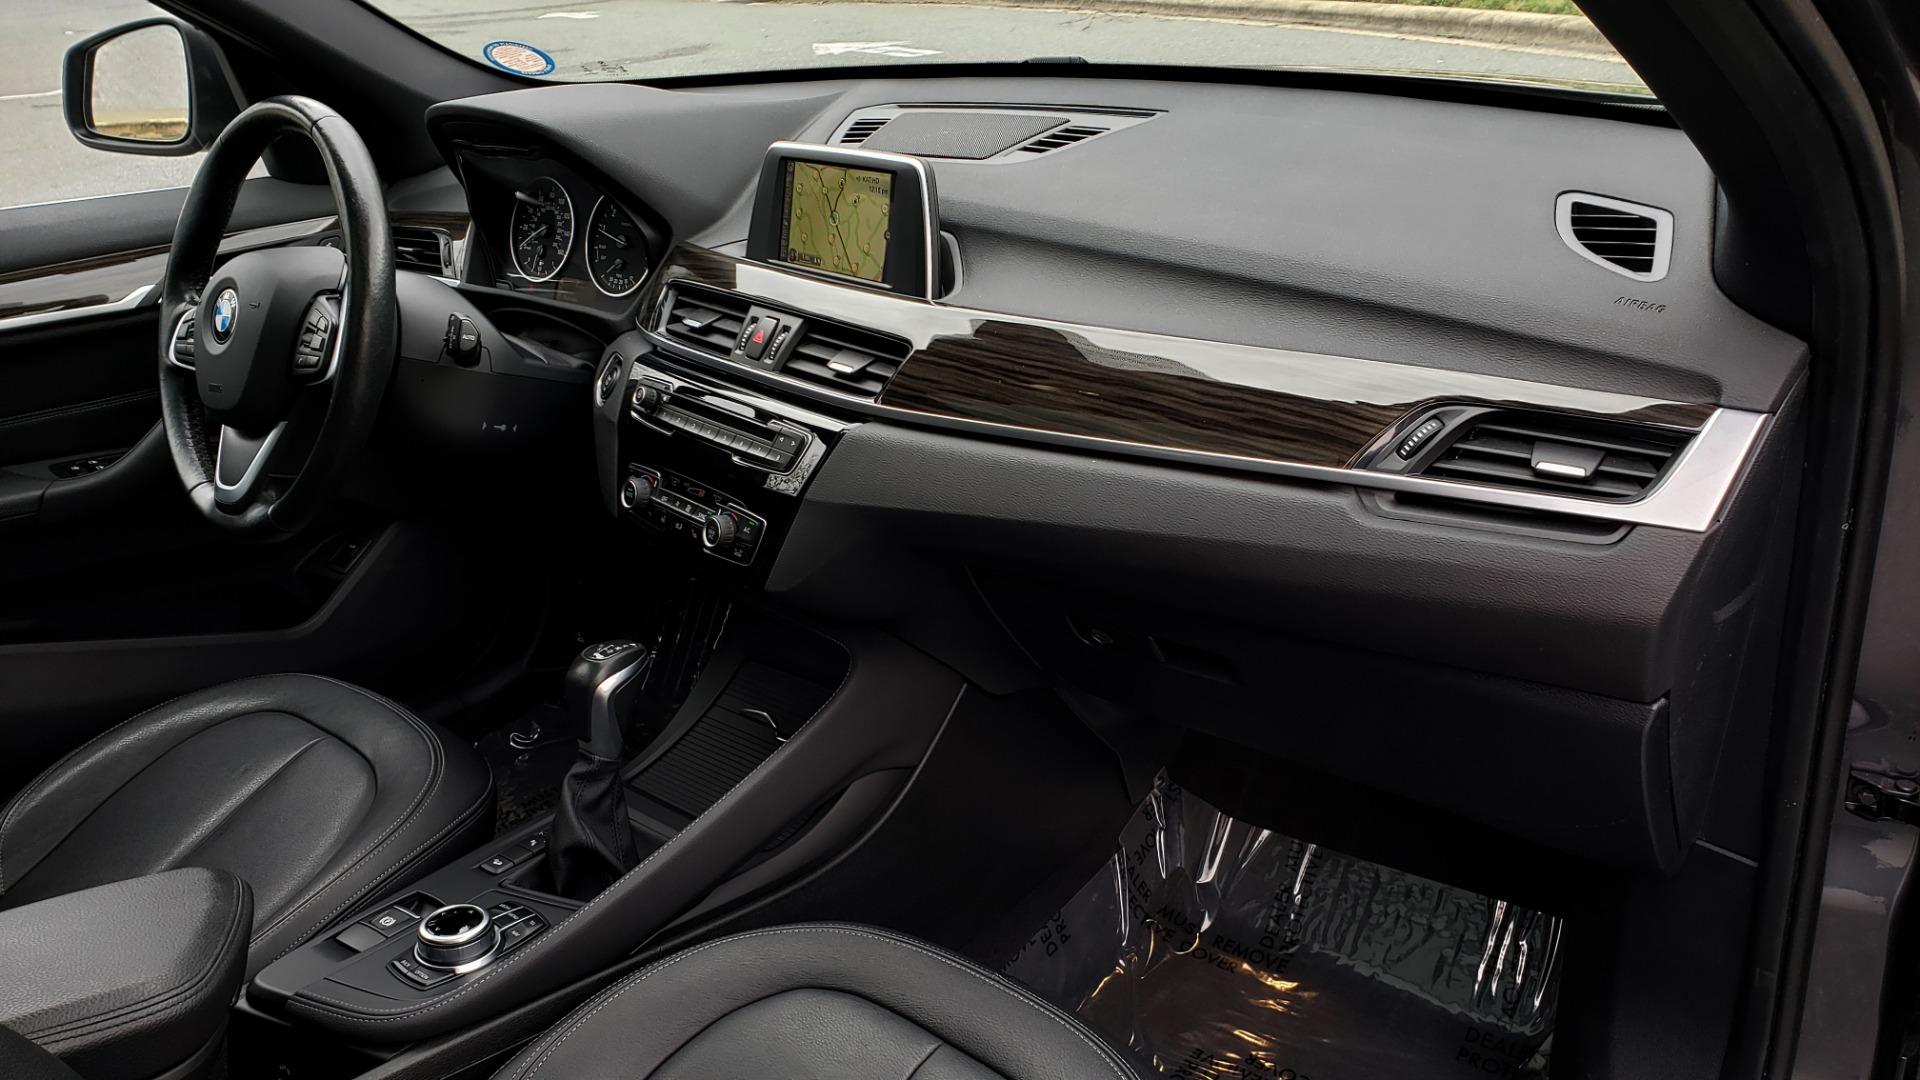 Used 2017 BMW X1 XDRIVE28I / PREM PKG / DRIVER ASST / NAV / CLD WTHR for sale Sold at Formula Imports in Charlotte NC 28227 70